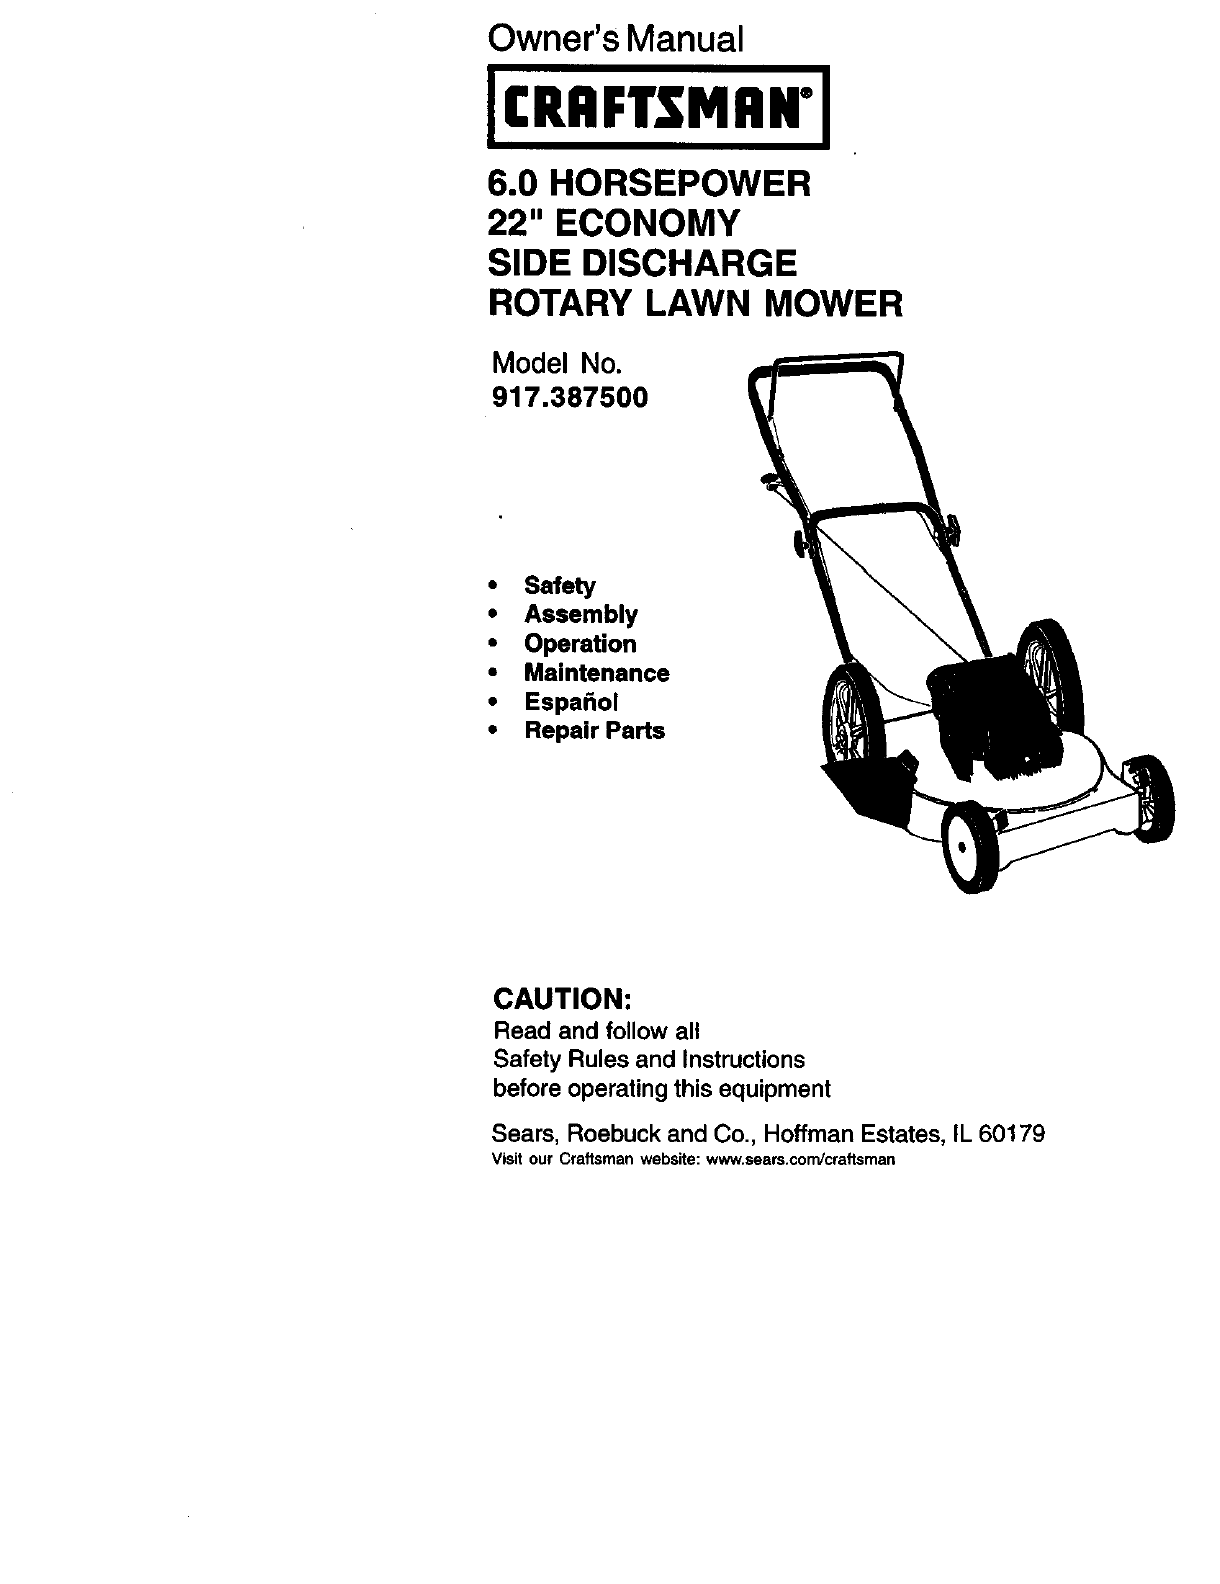 Craftsman 60 Lawn Mower Engine Diagram And Parts List For Walkbehindlawnmower 917387500 User Manual Gas Walk Behind Lawnmower Manuals Rh Usermanual Wiki Oil Capacity